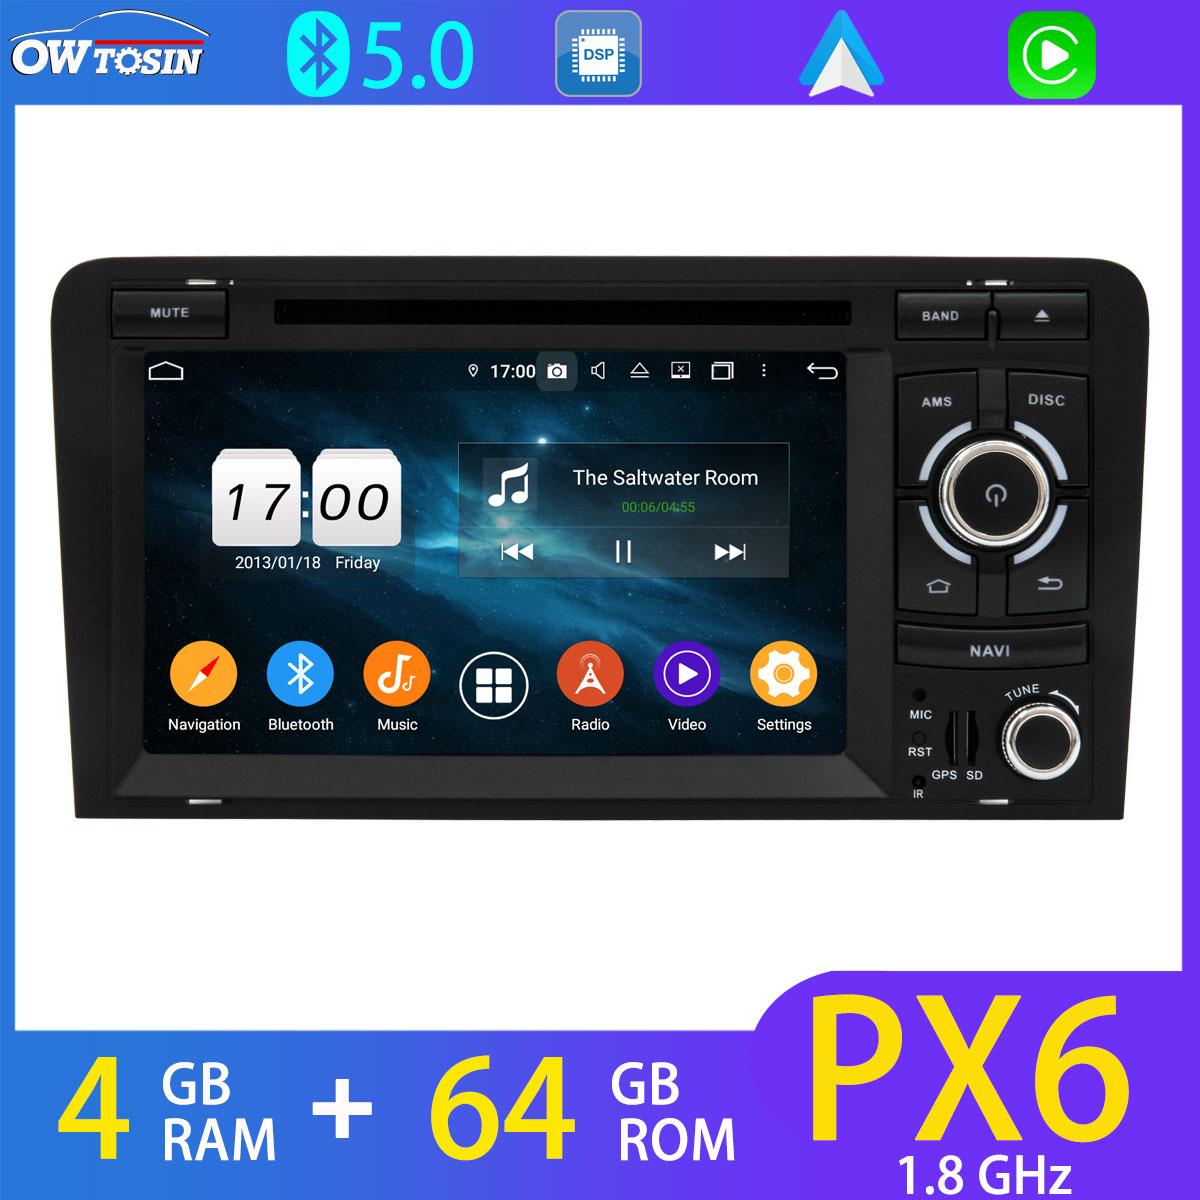 4G LTE PX6 4GB+64GB Car DVD Multimedia Player For Audi A3 S3 RS3 RNSE-PU 2003-2013 BT 5.0 Android GPS Navi Radio DAB DSP Carplay